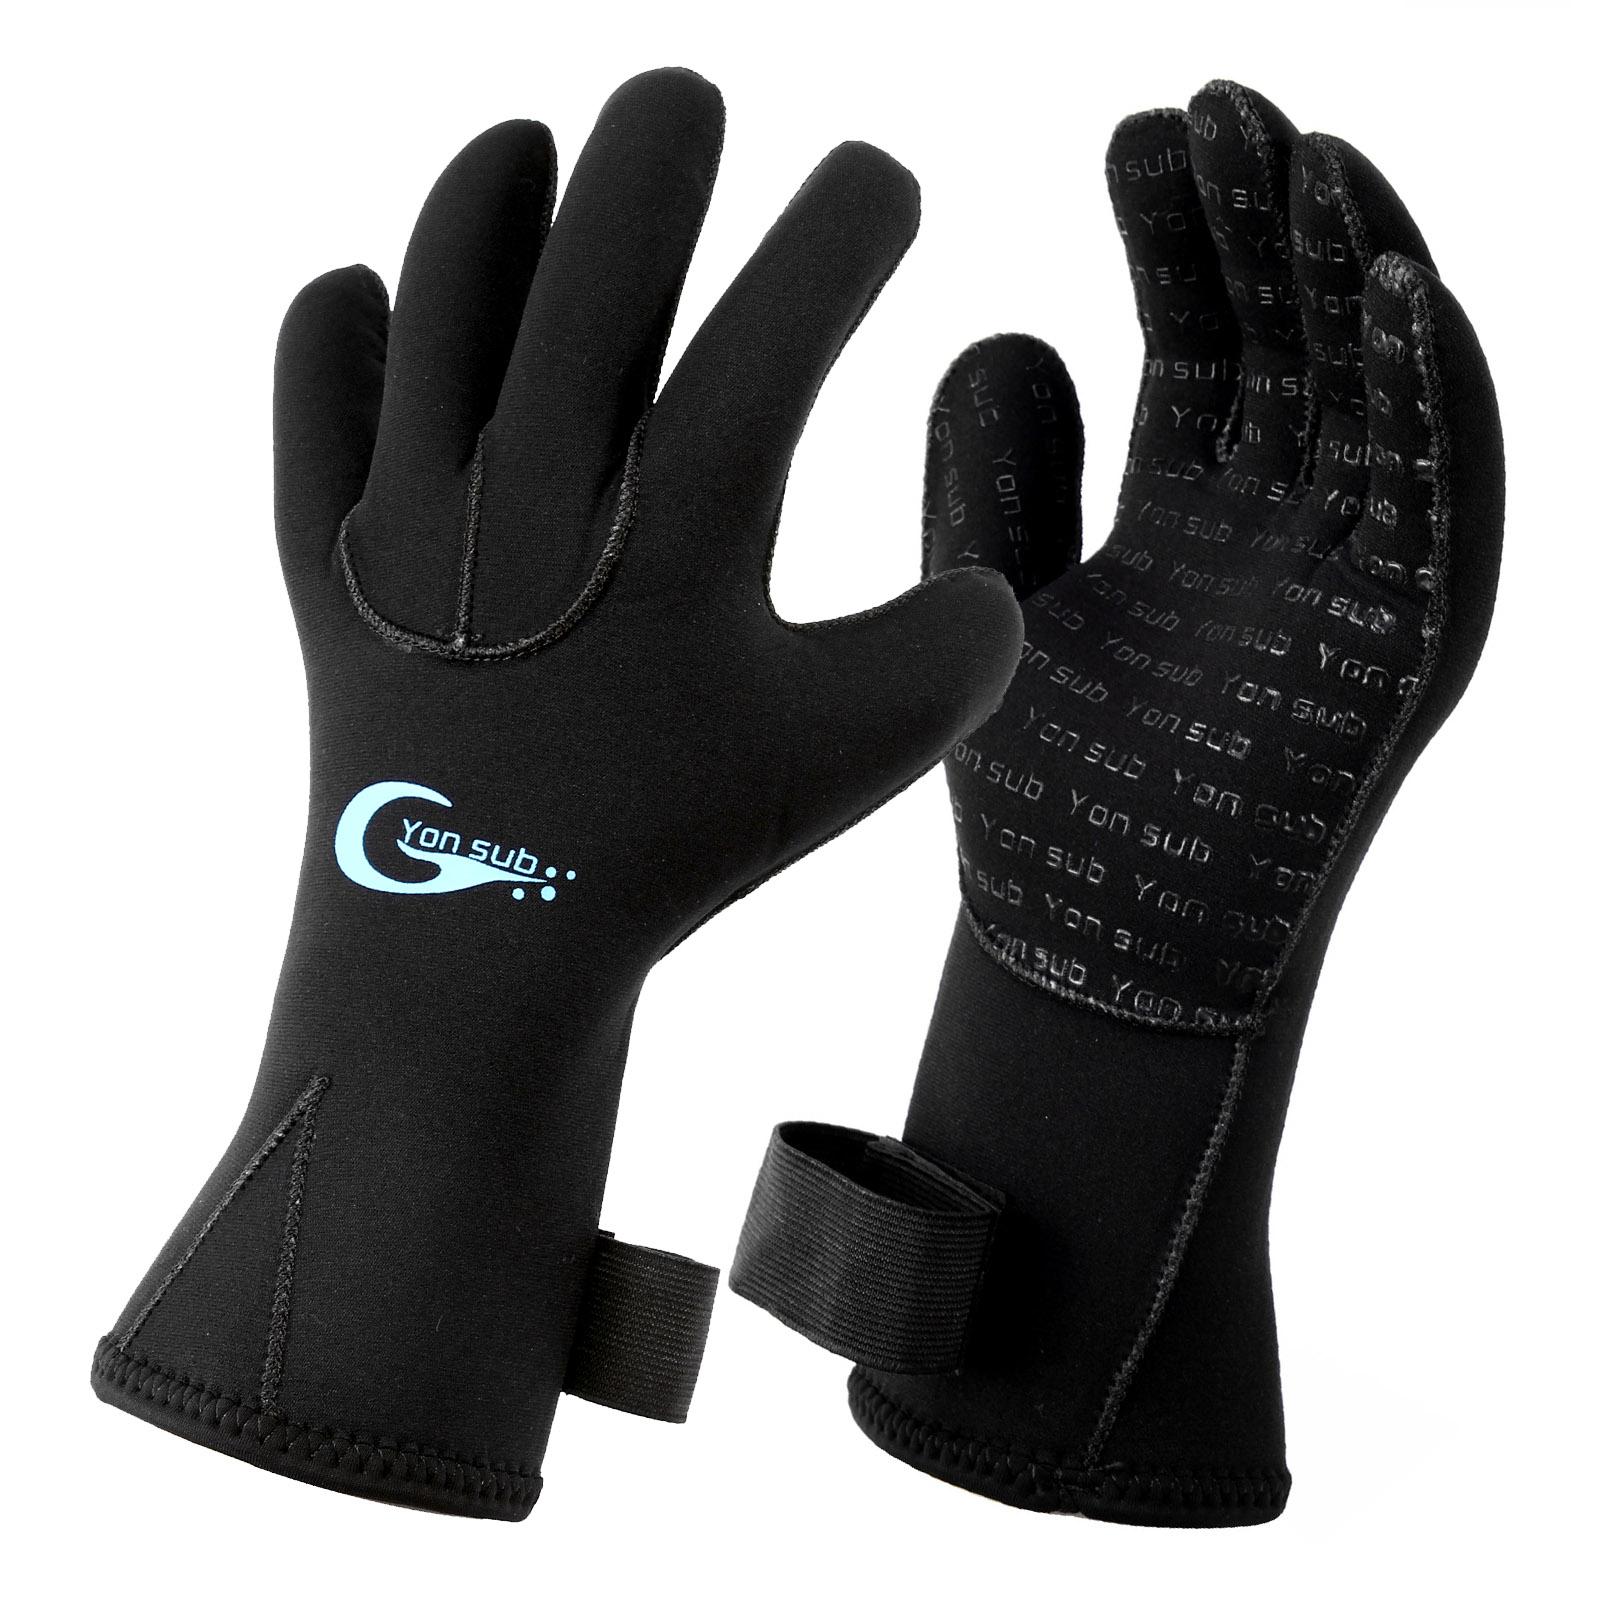 WETSUIT-GLOVES-SURFING-DIVE-SCUBA-DIVING-GLOVES-3MM-Diving-Glove-Neoprene-Gloves thumbnail 15